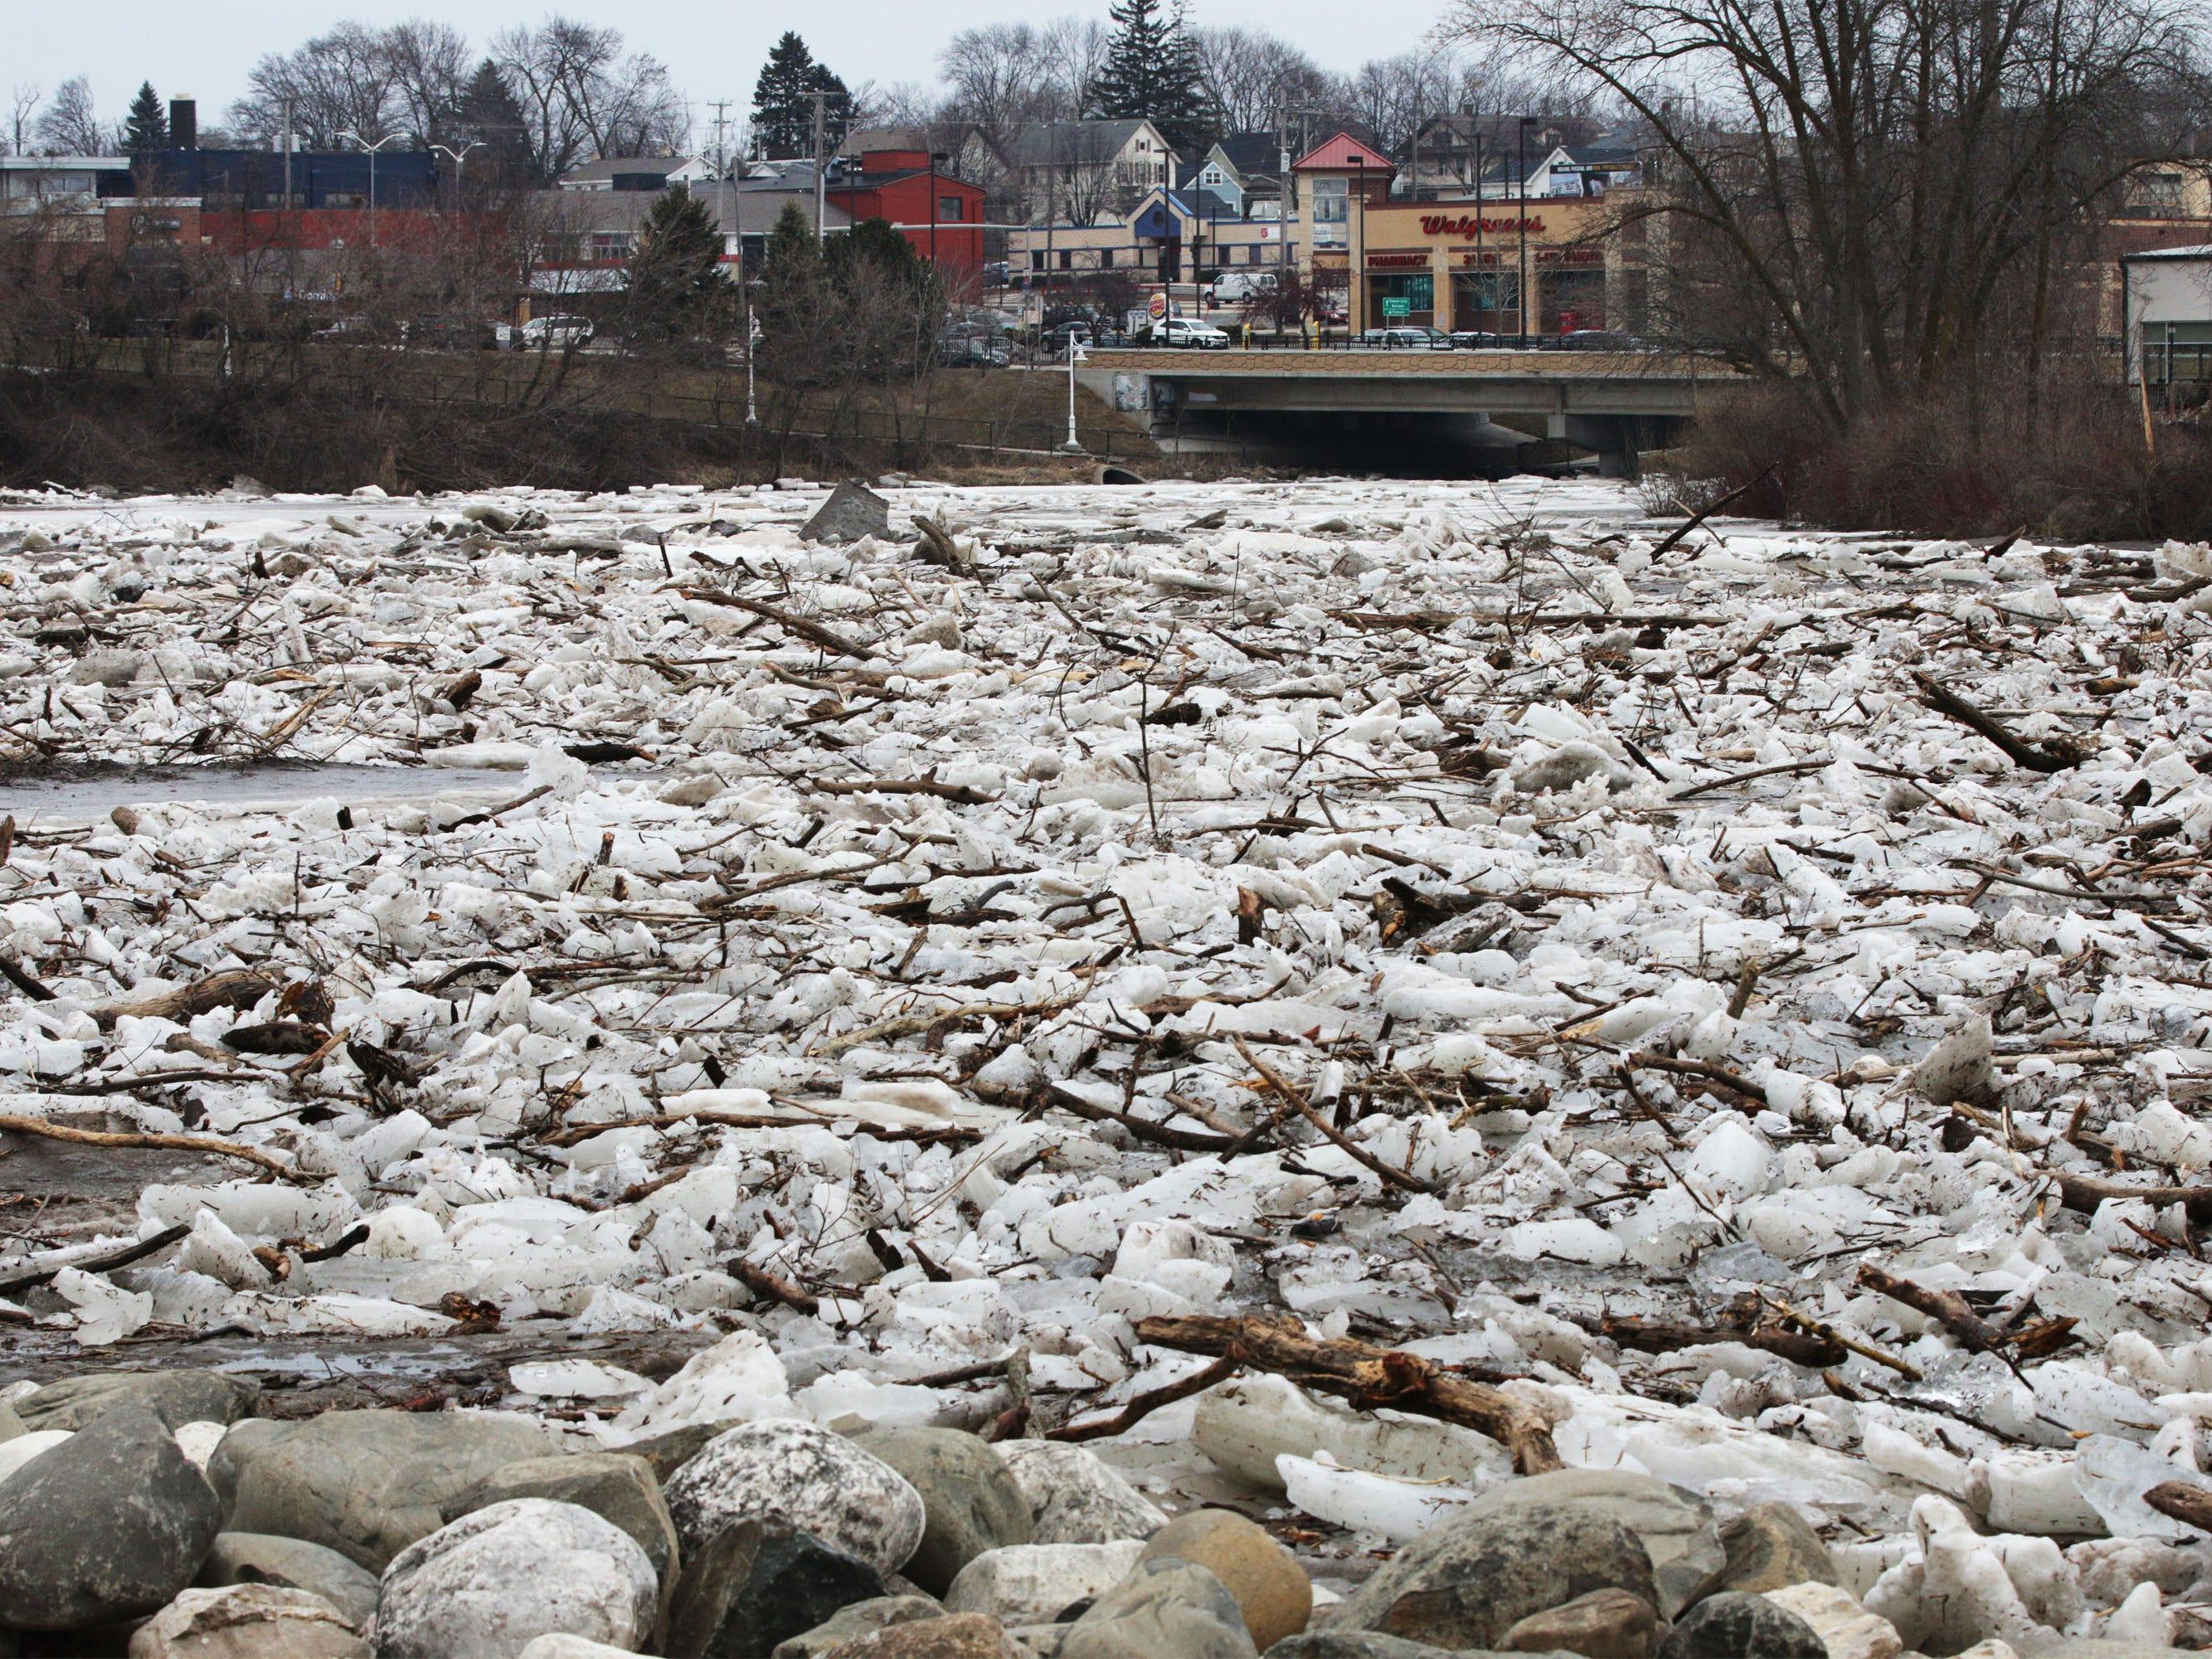 Ice jams on the Sheboygan River at Kiwanis Park looking towards 14th Street, Wednesday, March 20, 2019, in Sheboygan, Wis.